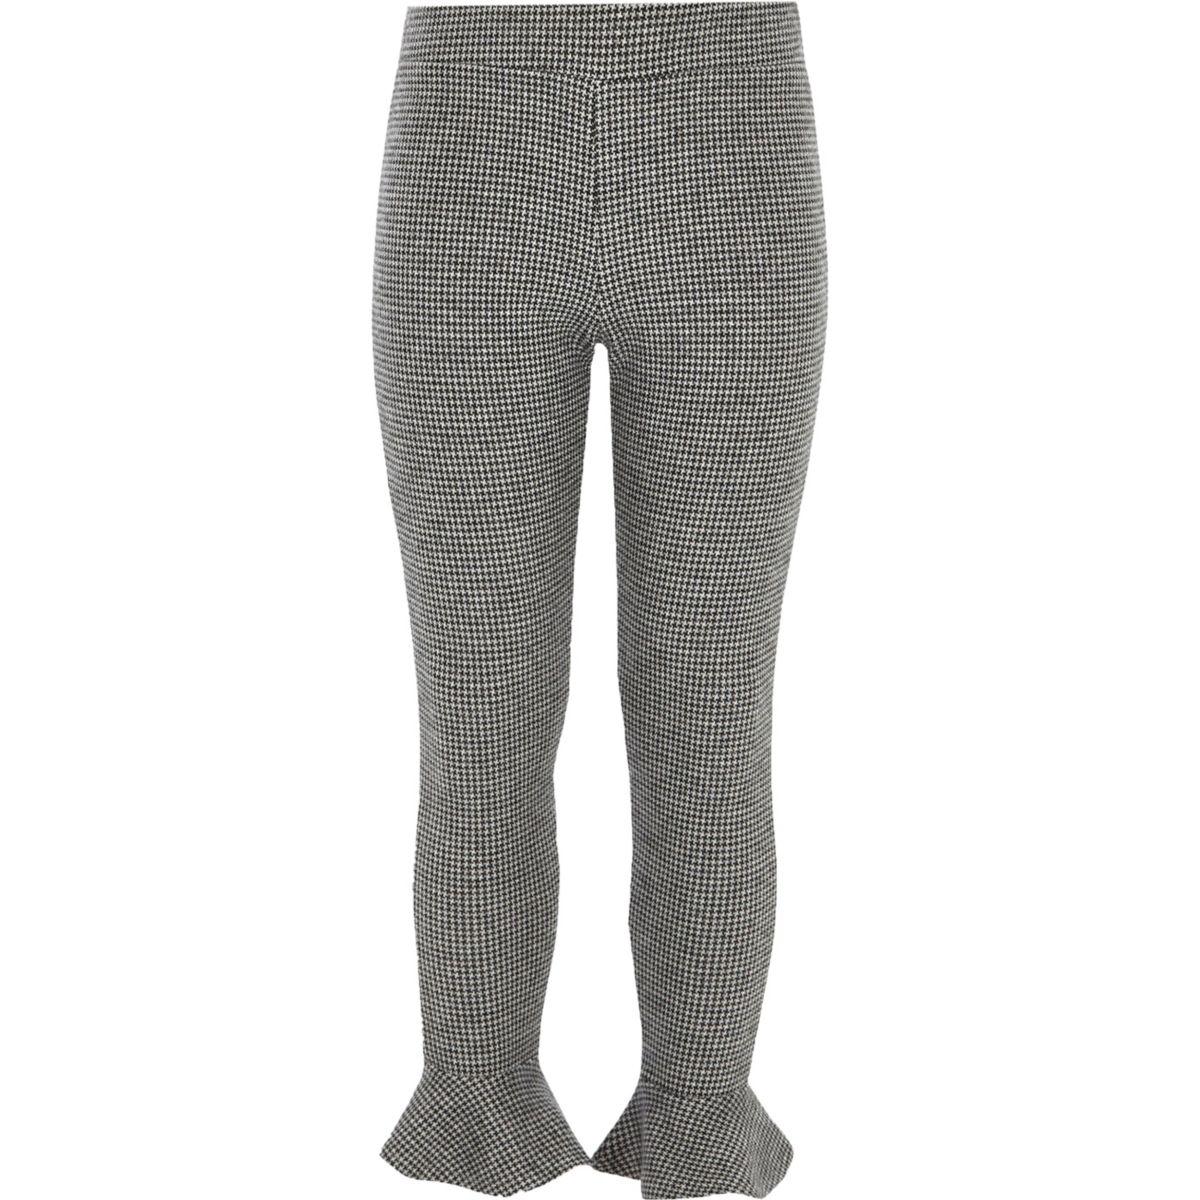 Girls grey dogtooth check frill leggings